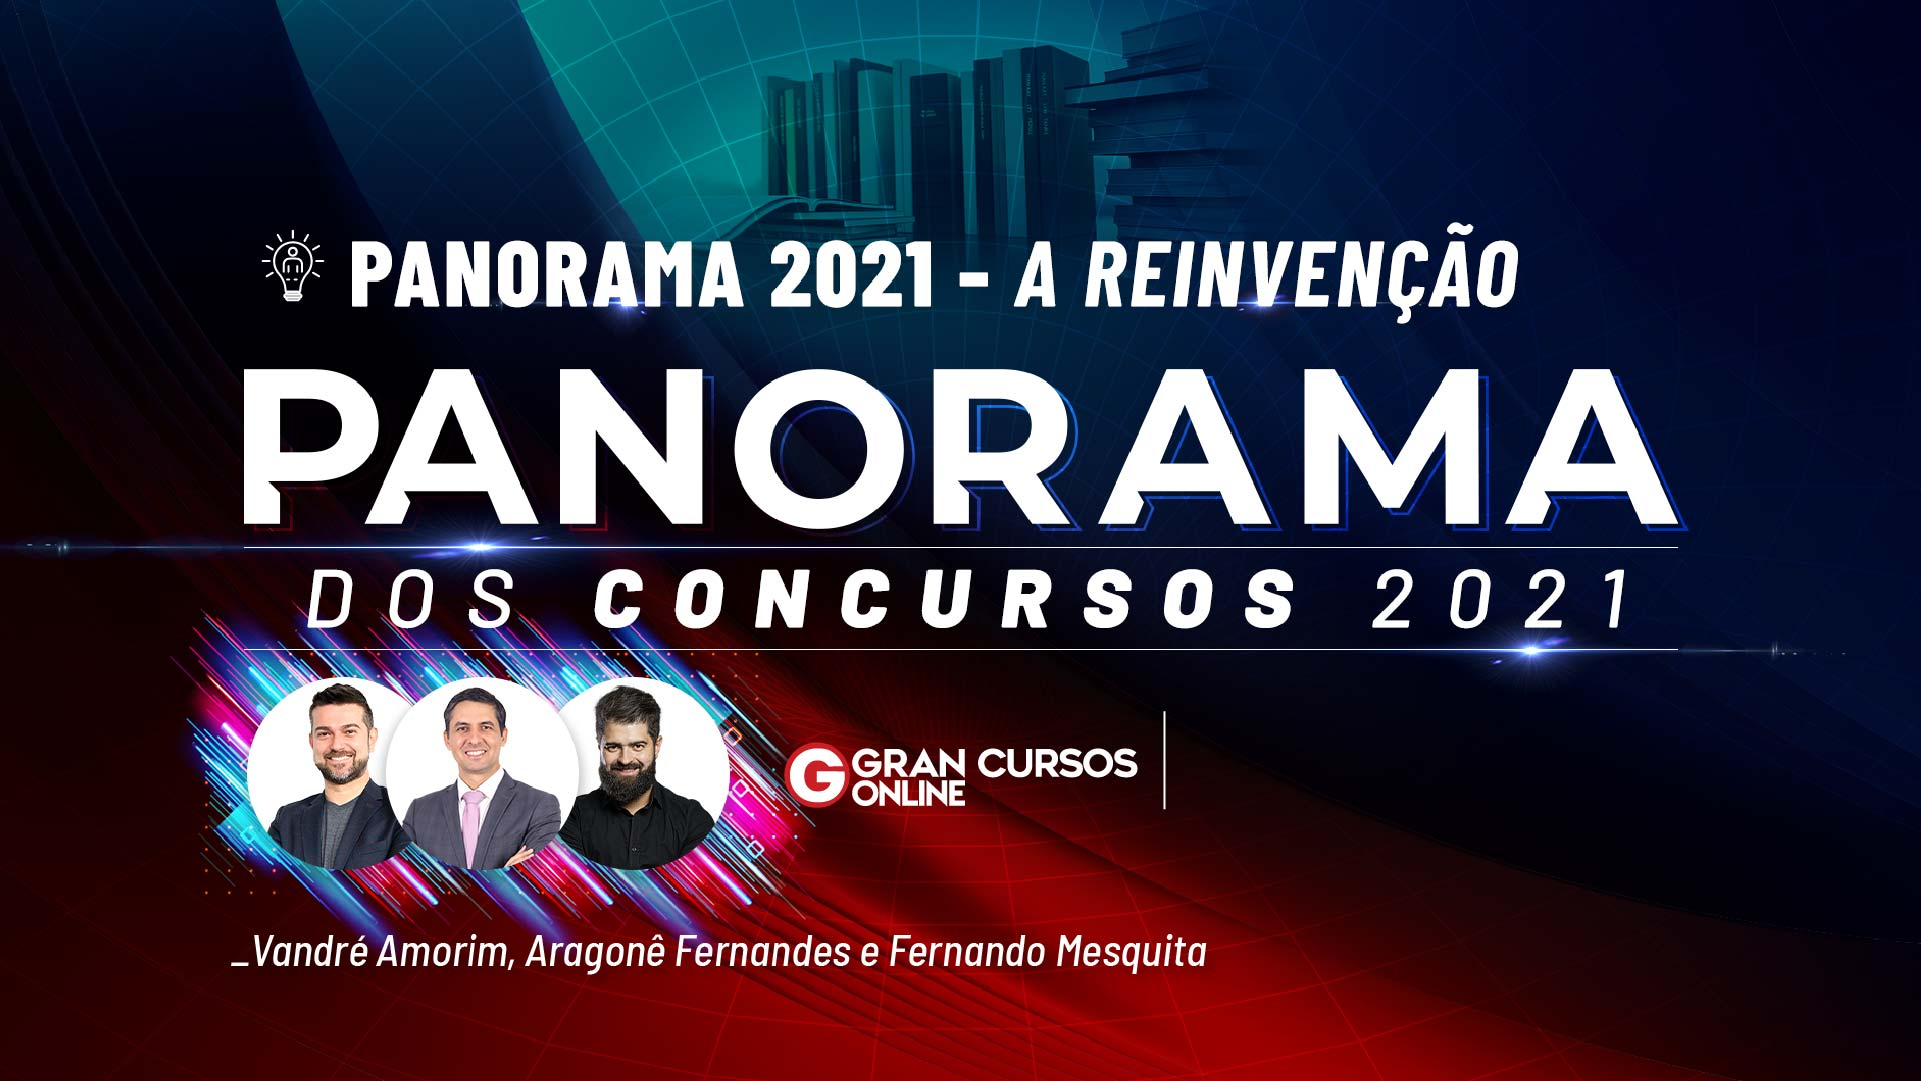 Panorama 2021